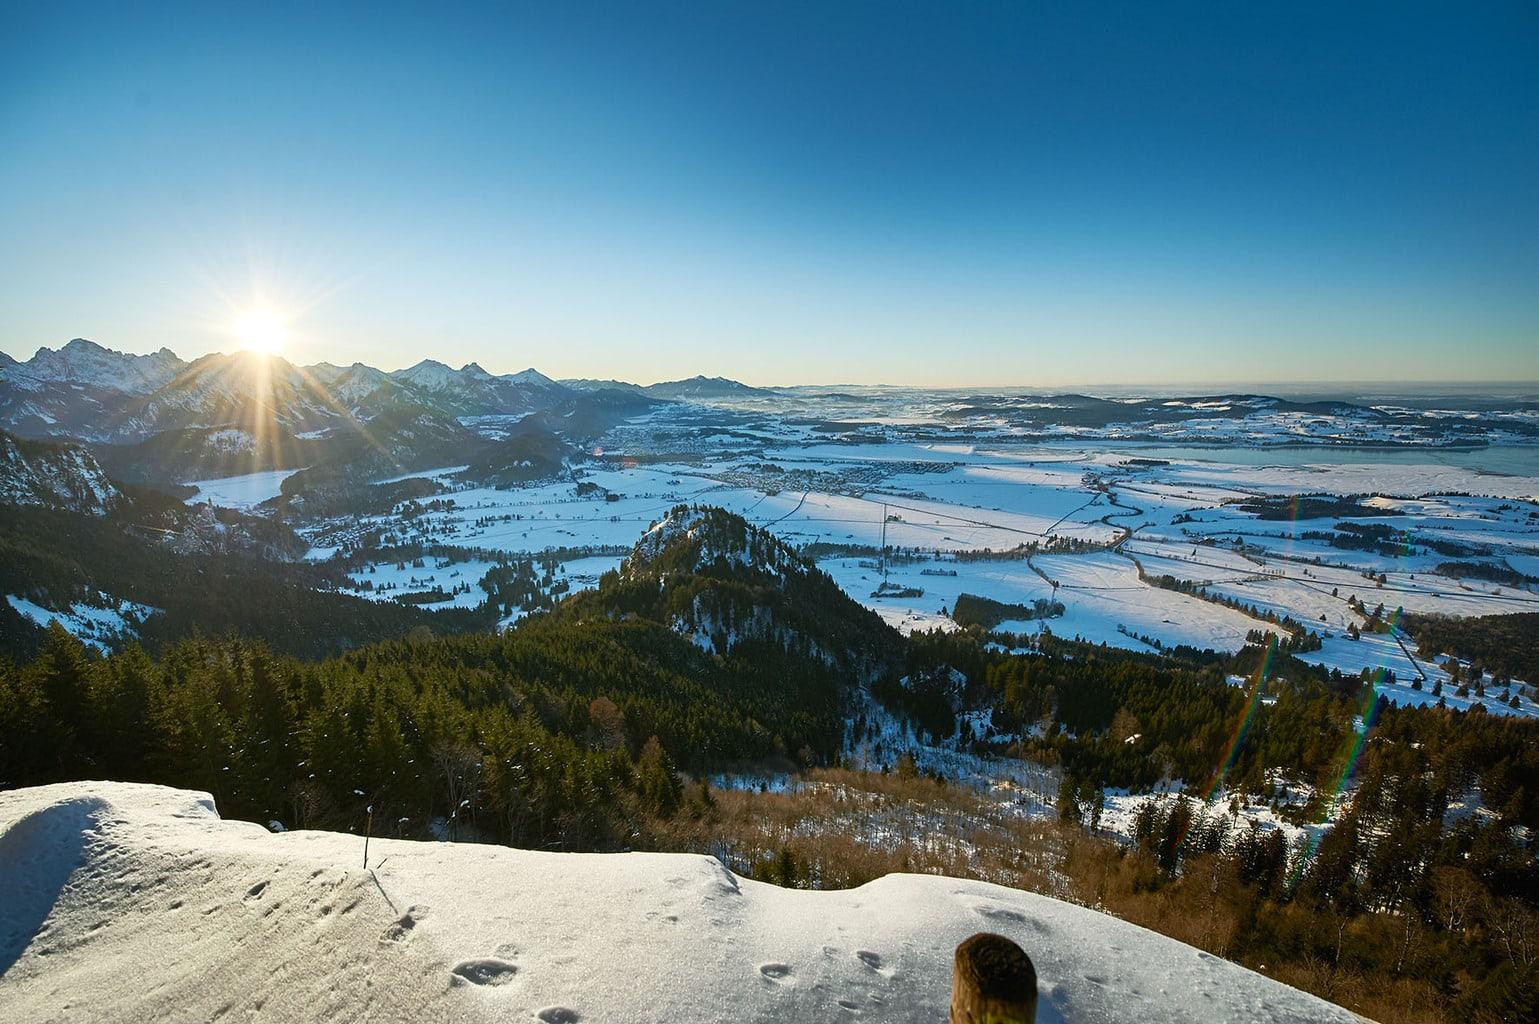 Briljant winterlandschap met veel sneeuw in de Allgäuer Hörnerdörfer